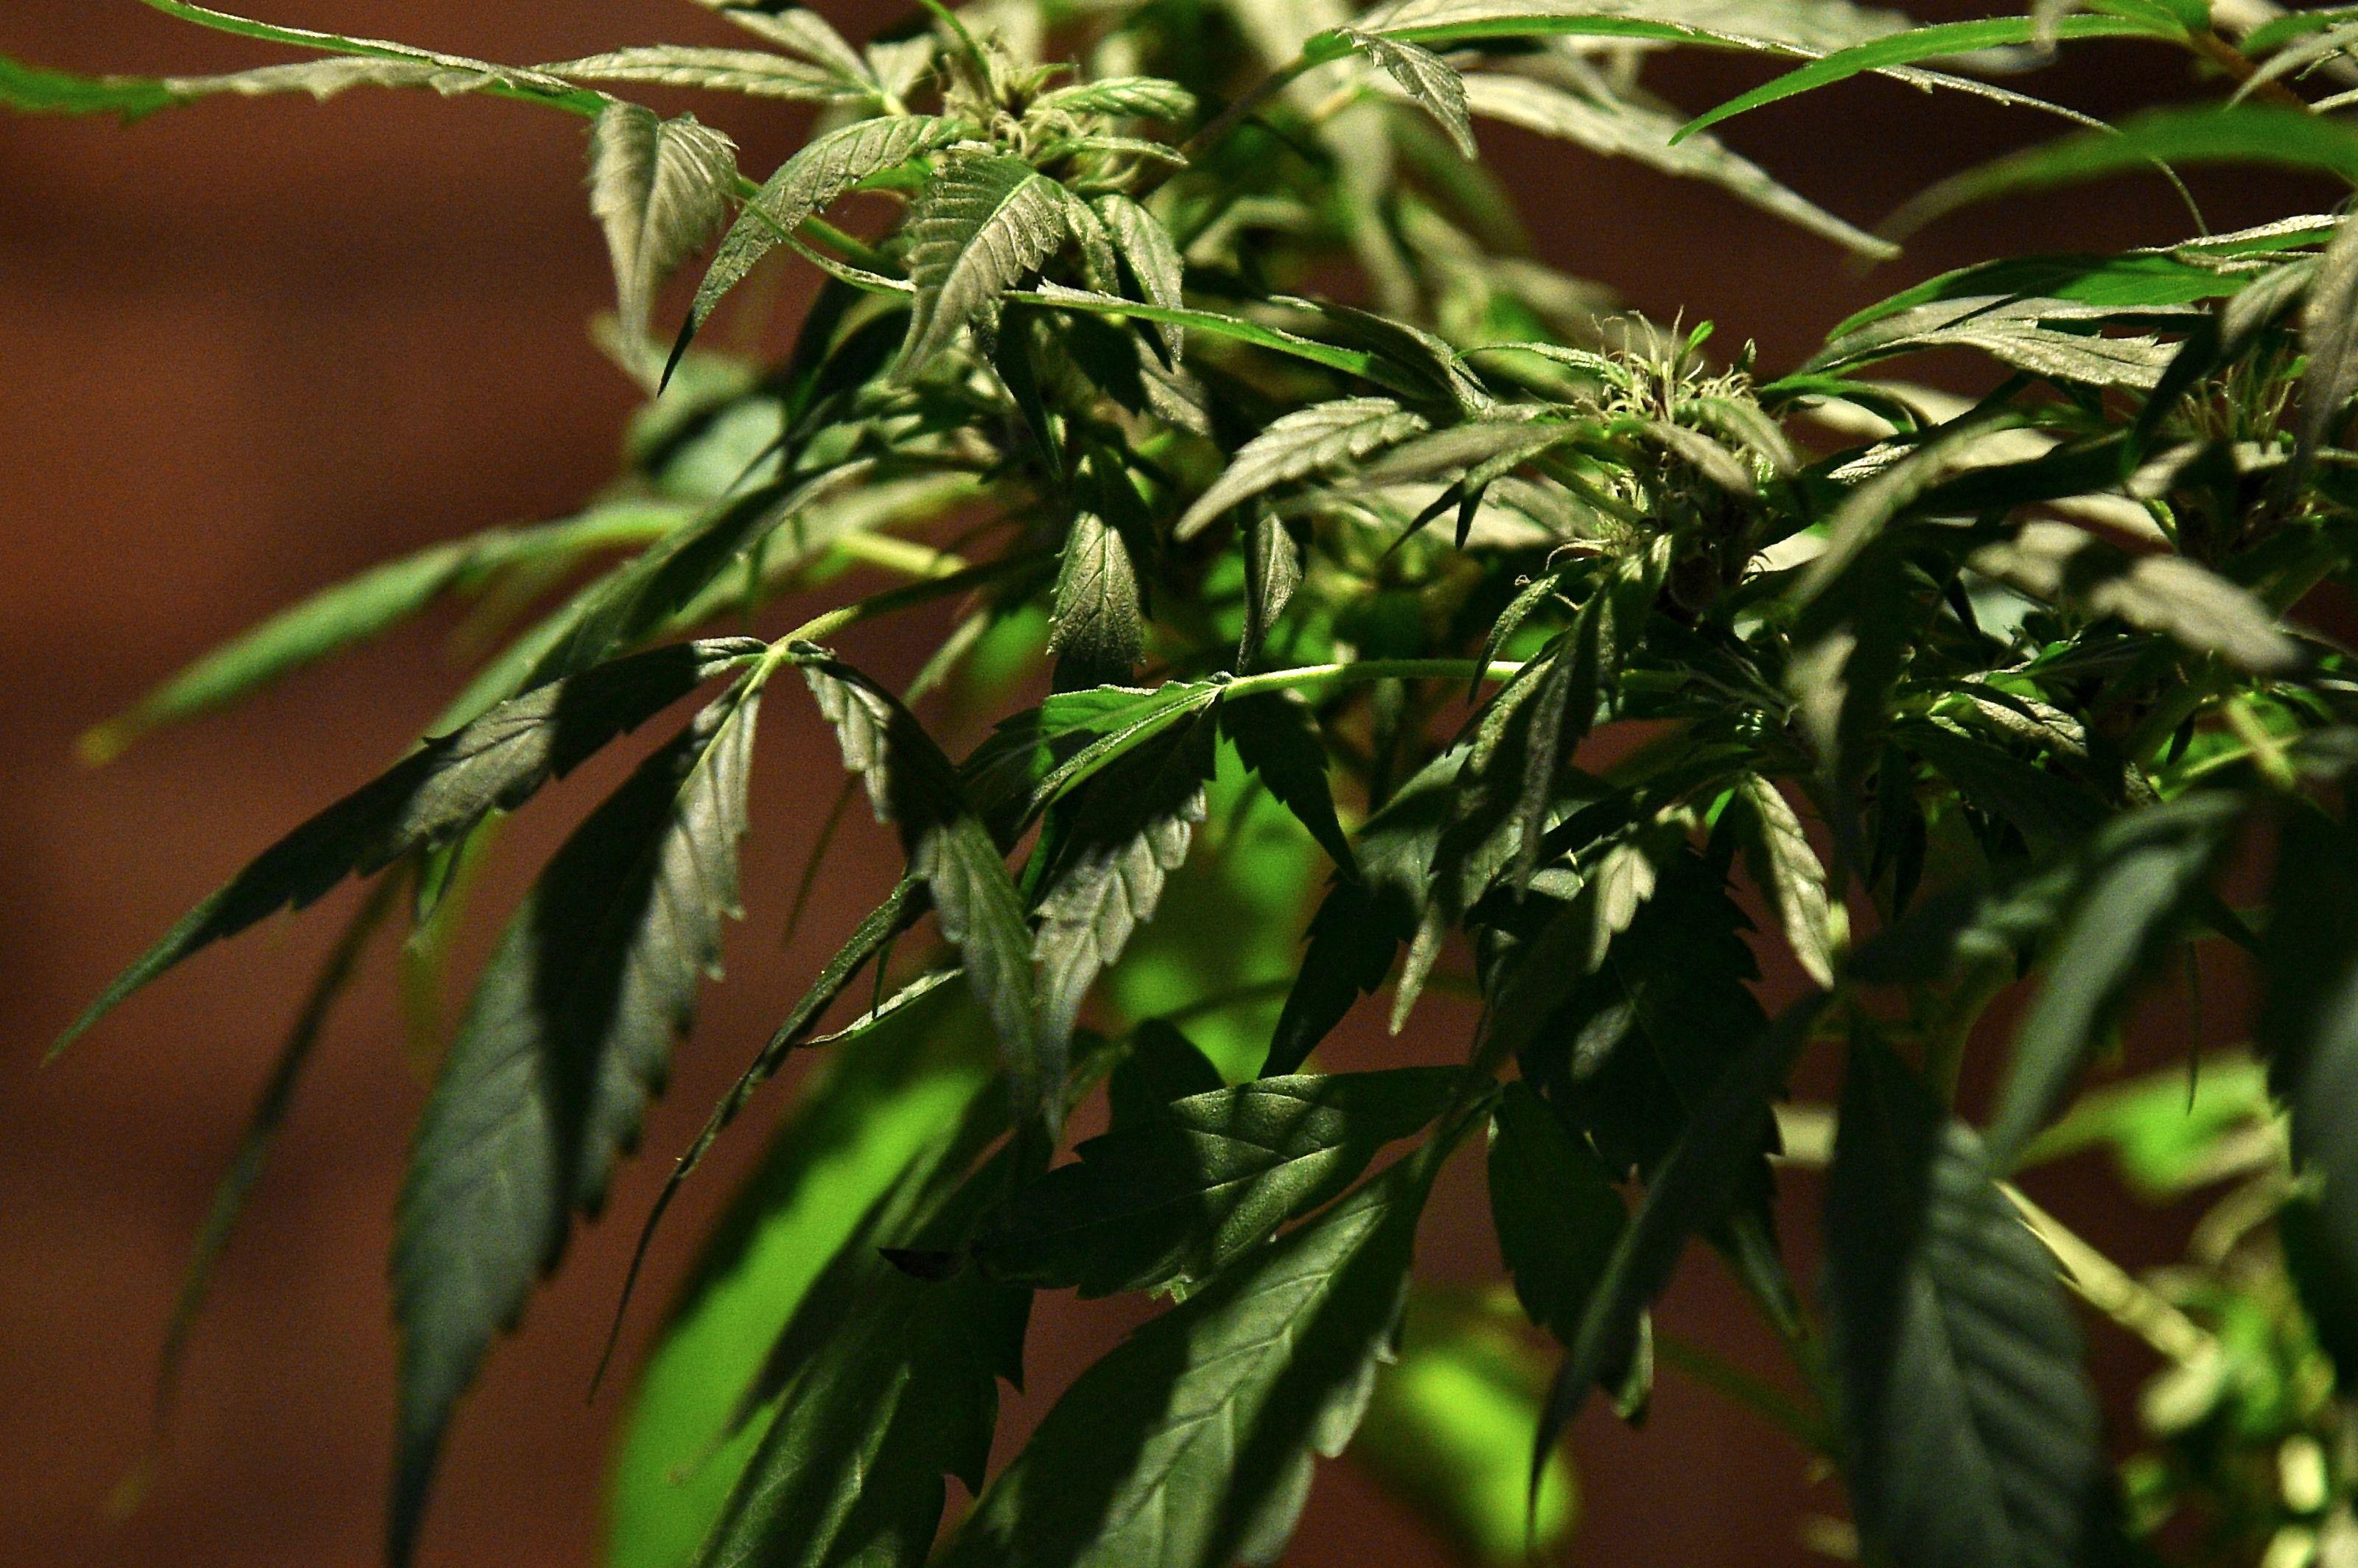 Pot/marijuana